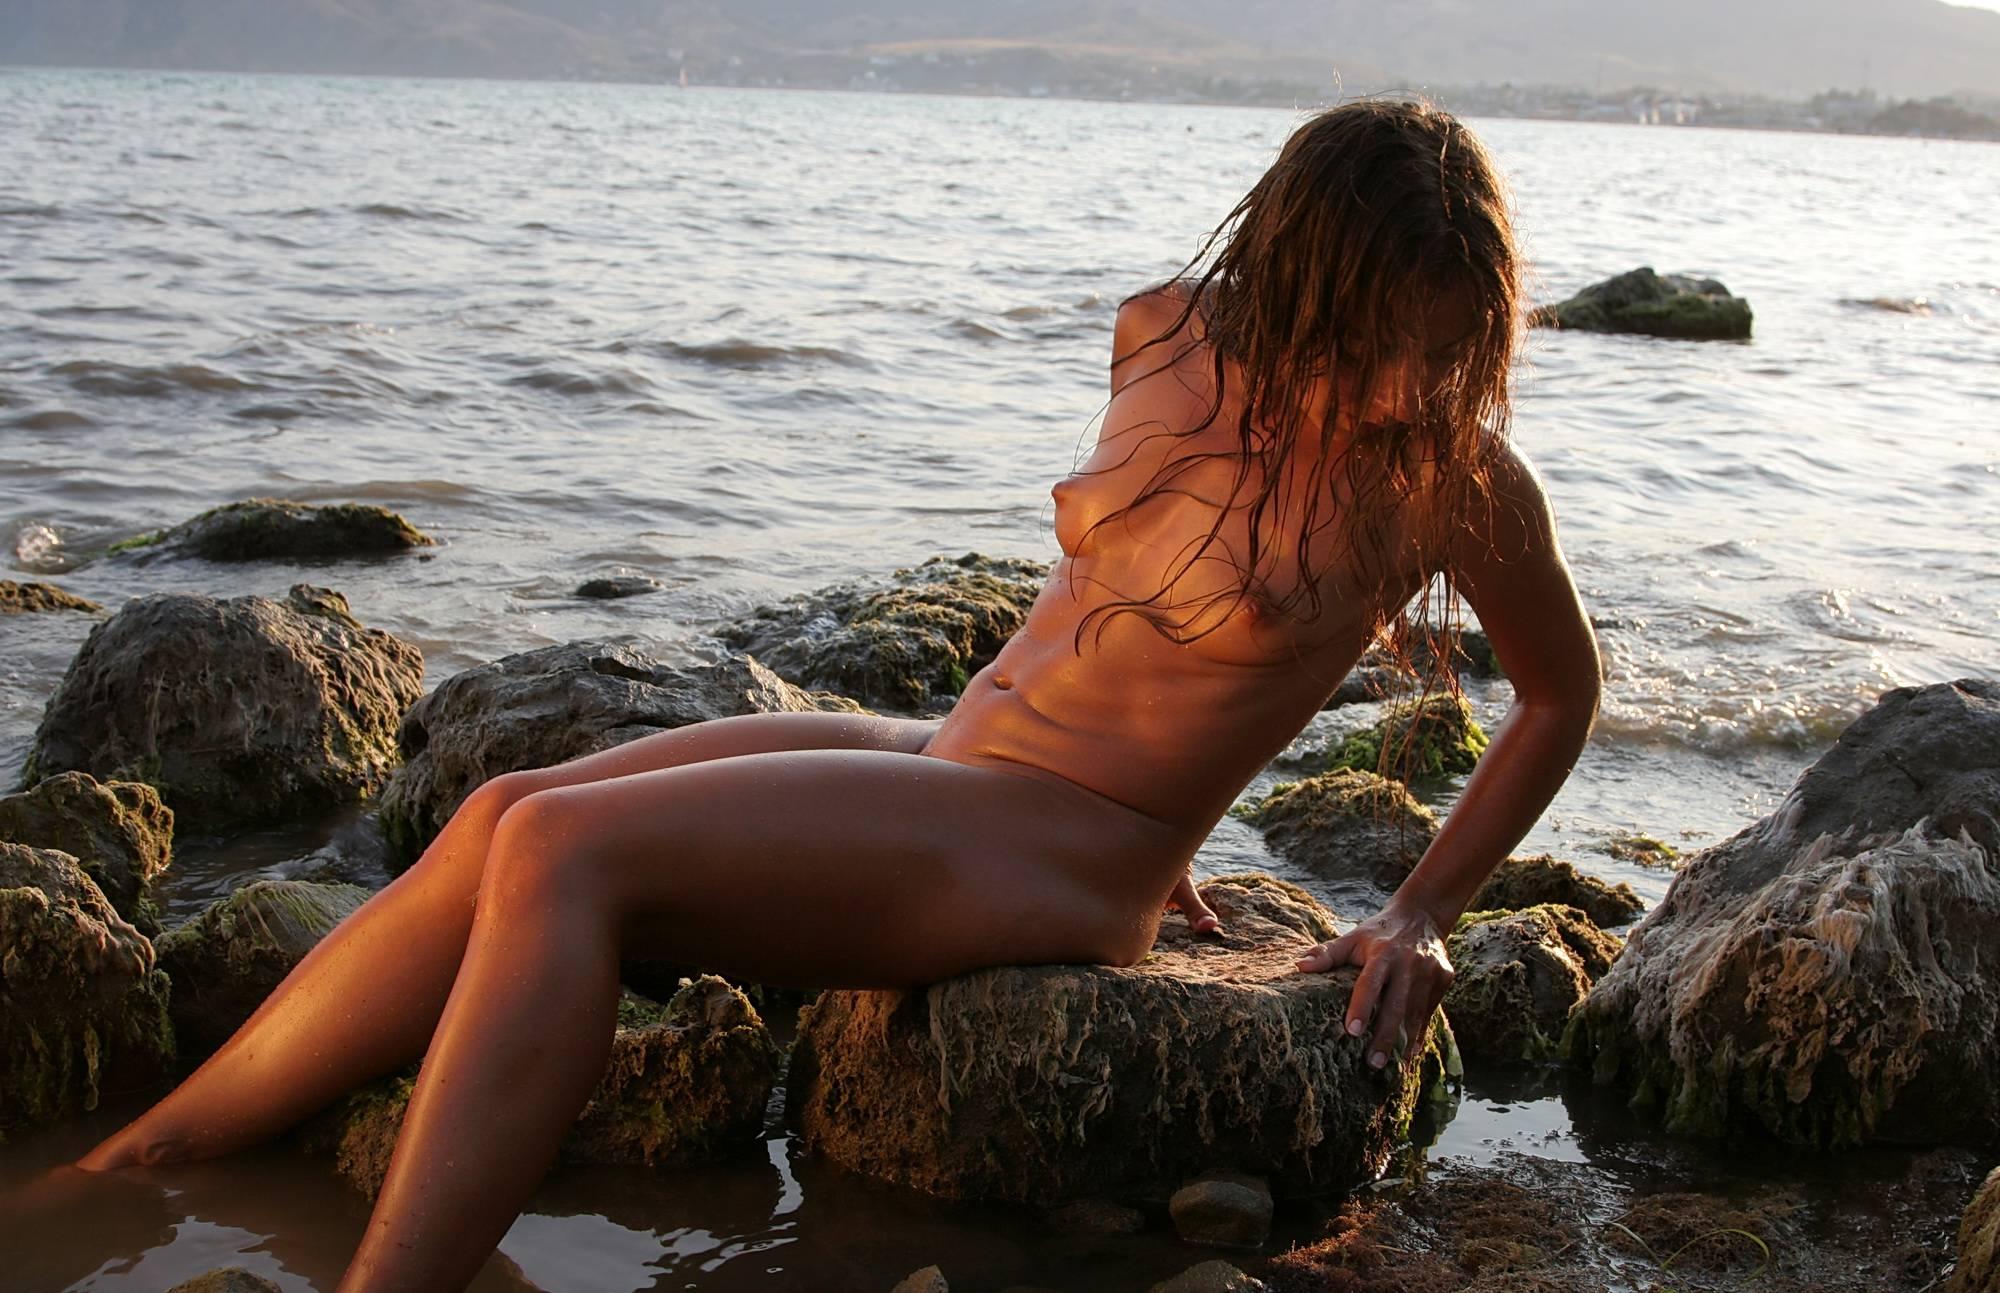 Nudist Photos Mossy Rocks Amid Dusk - 2